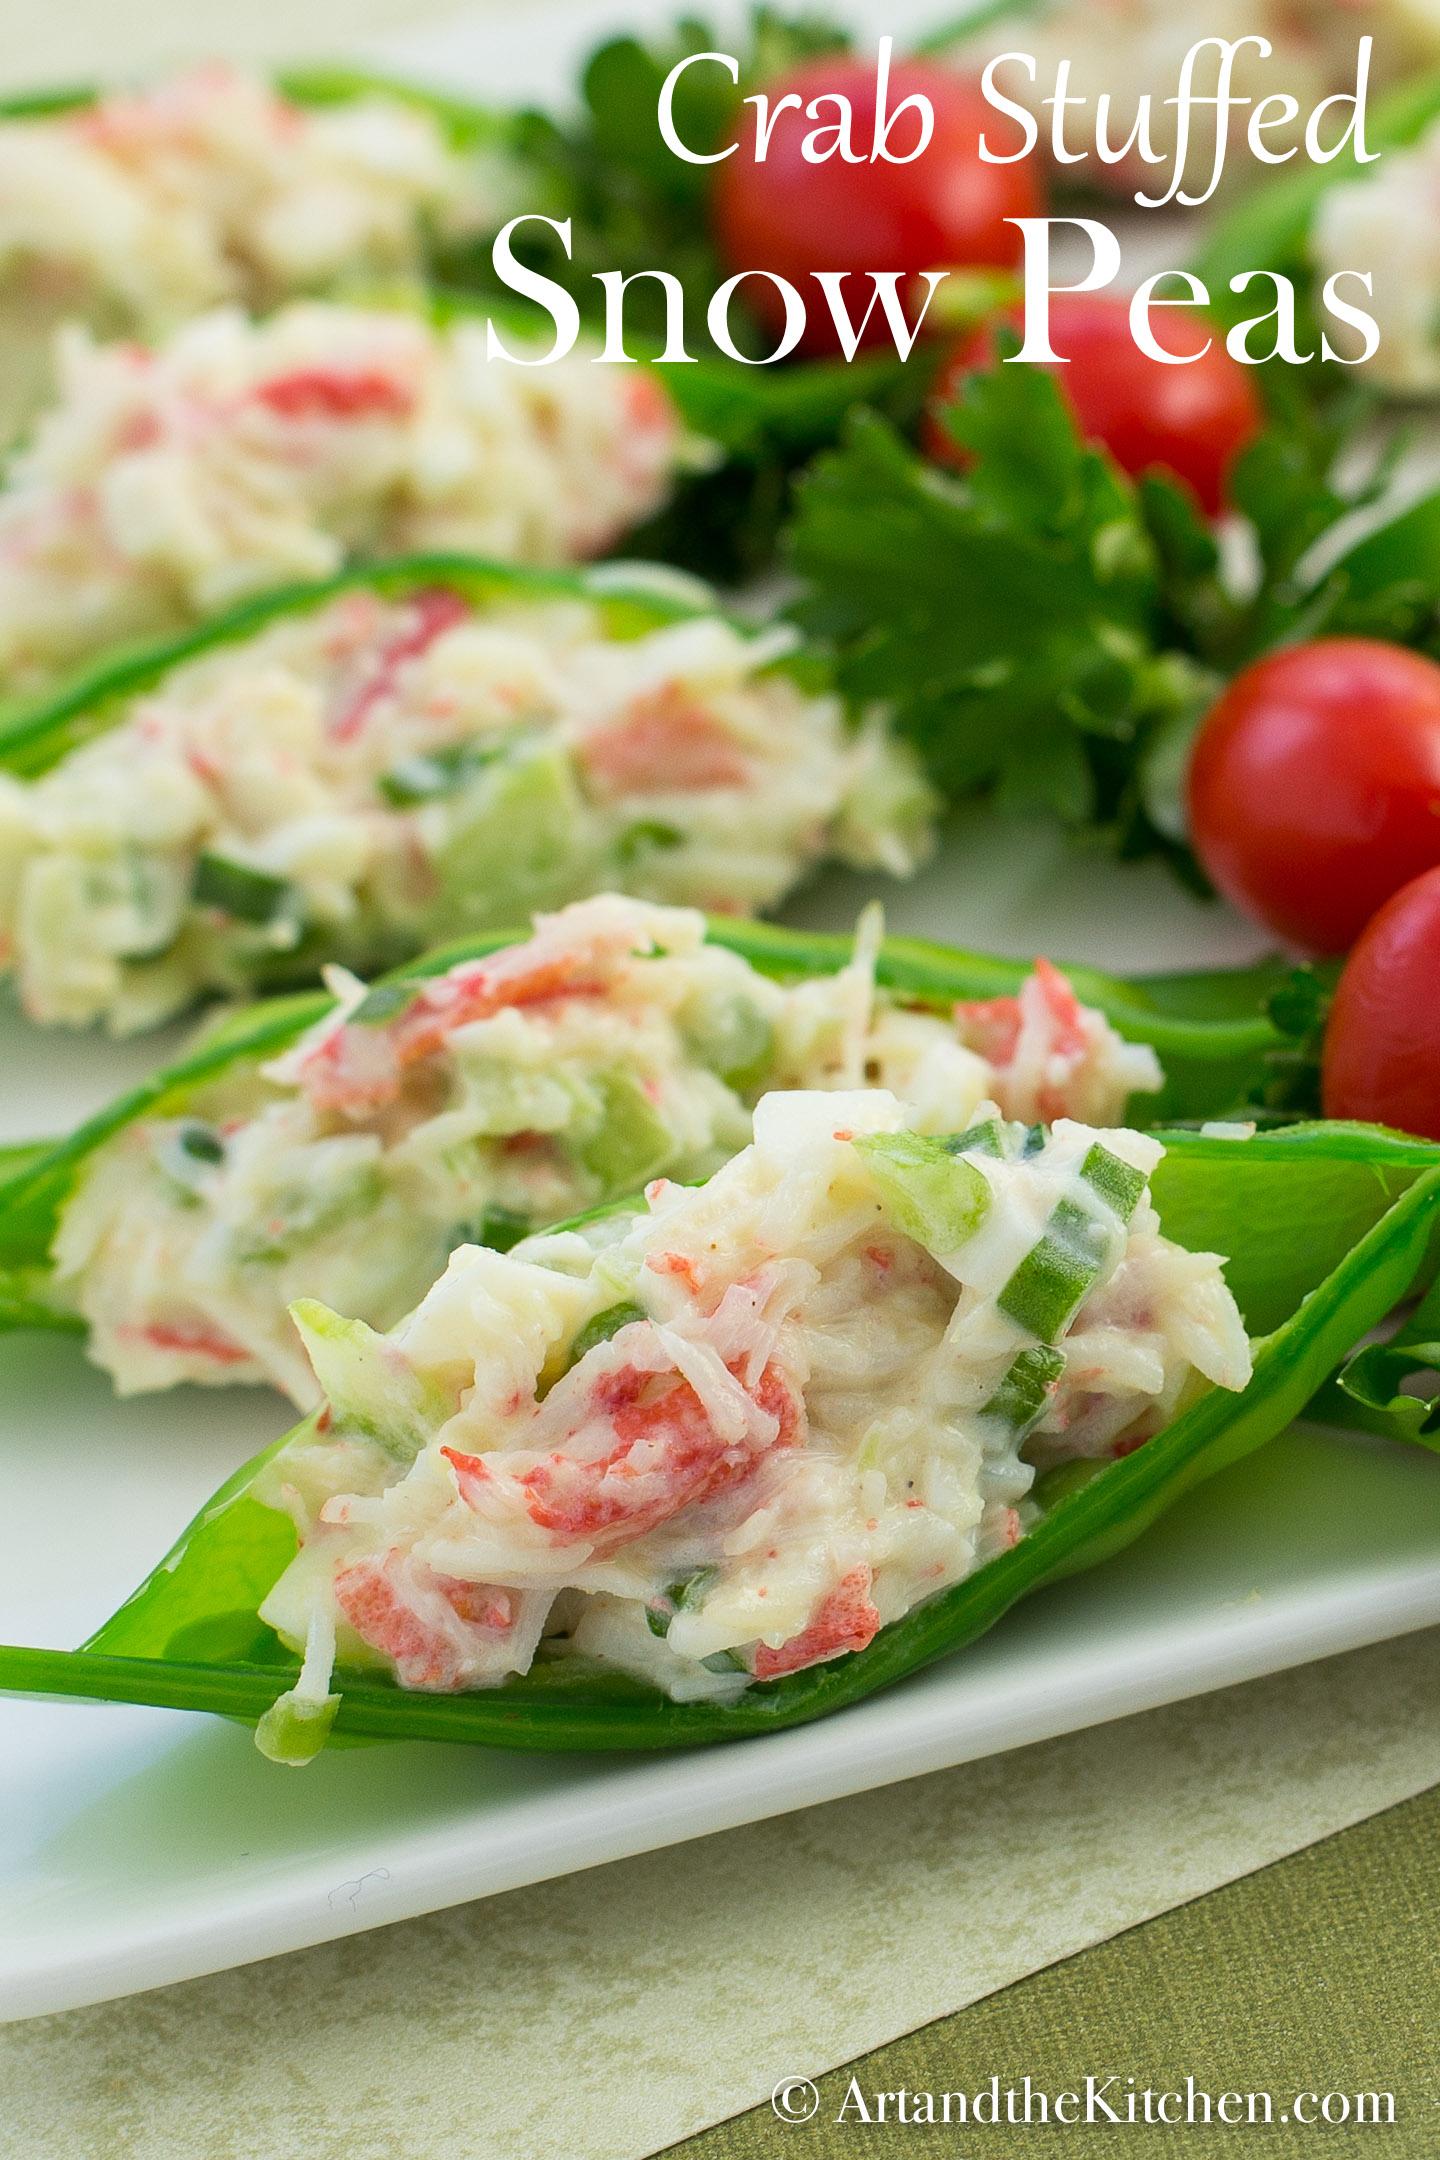 Crab stuffed Snow Peas